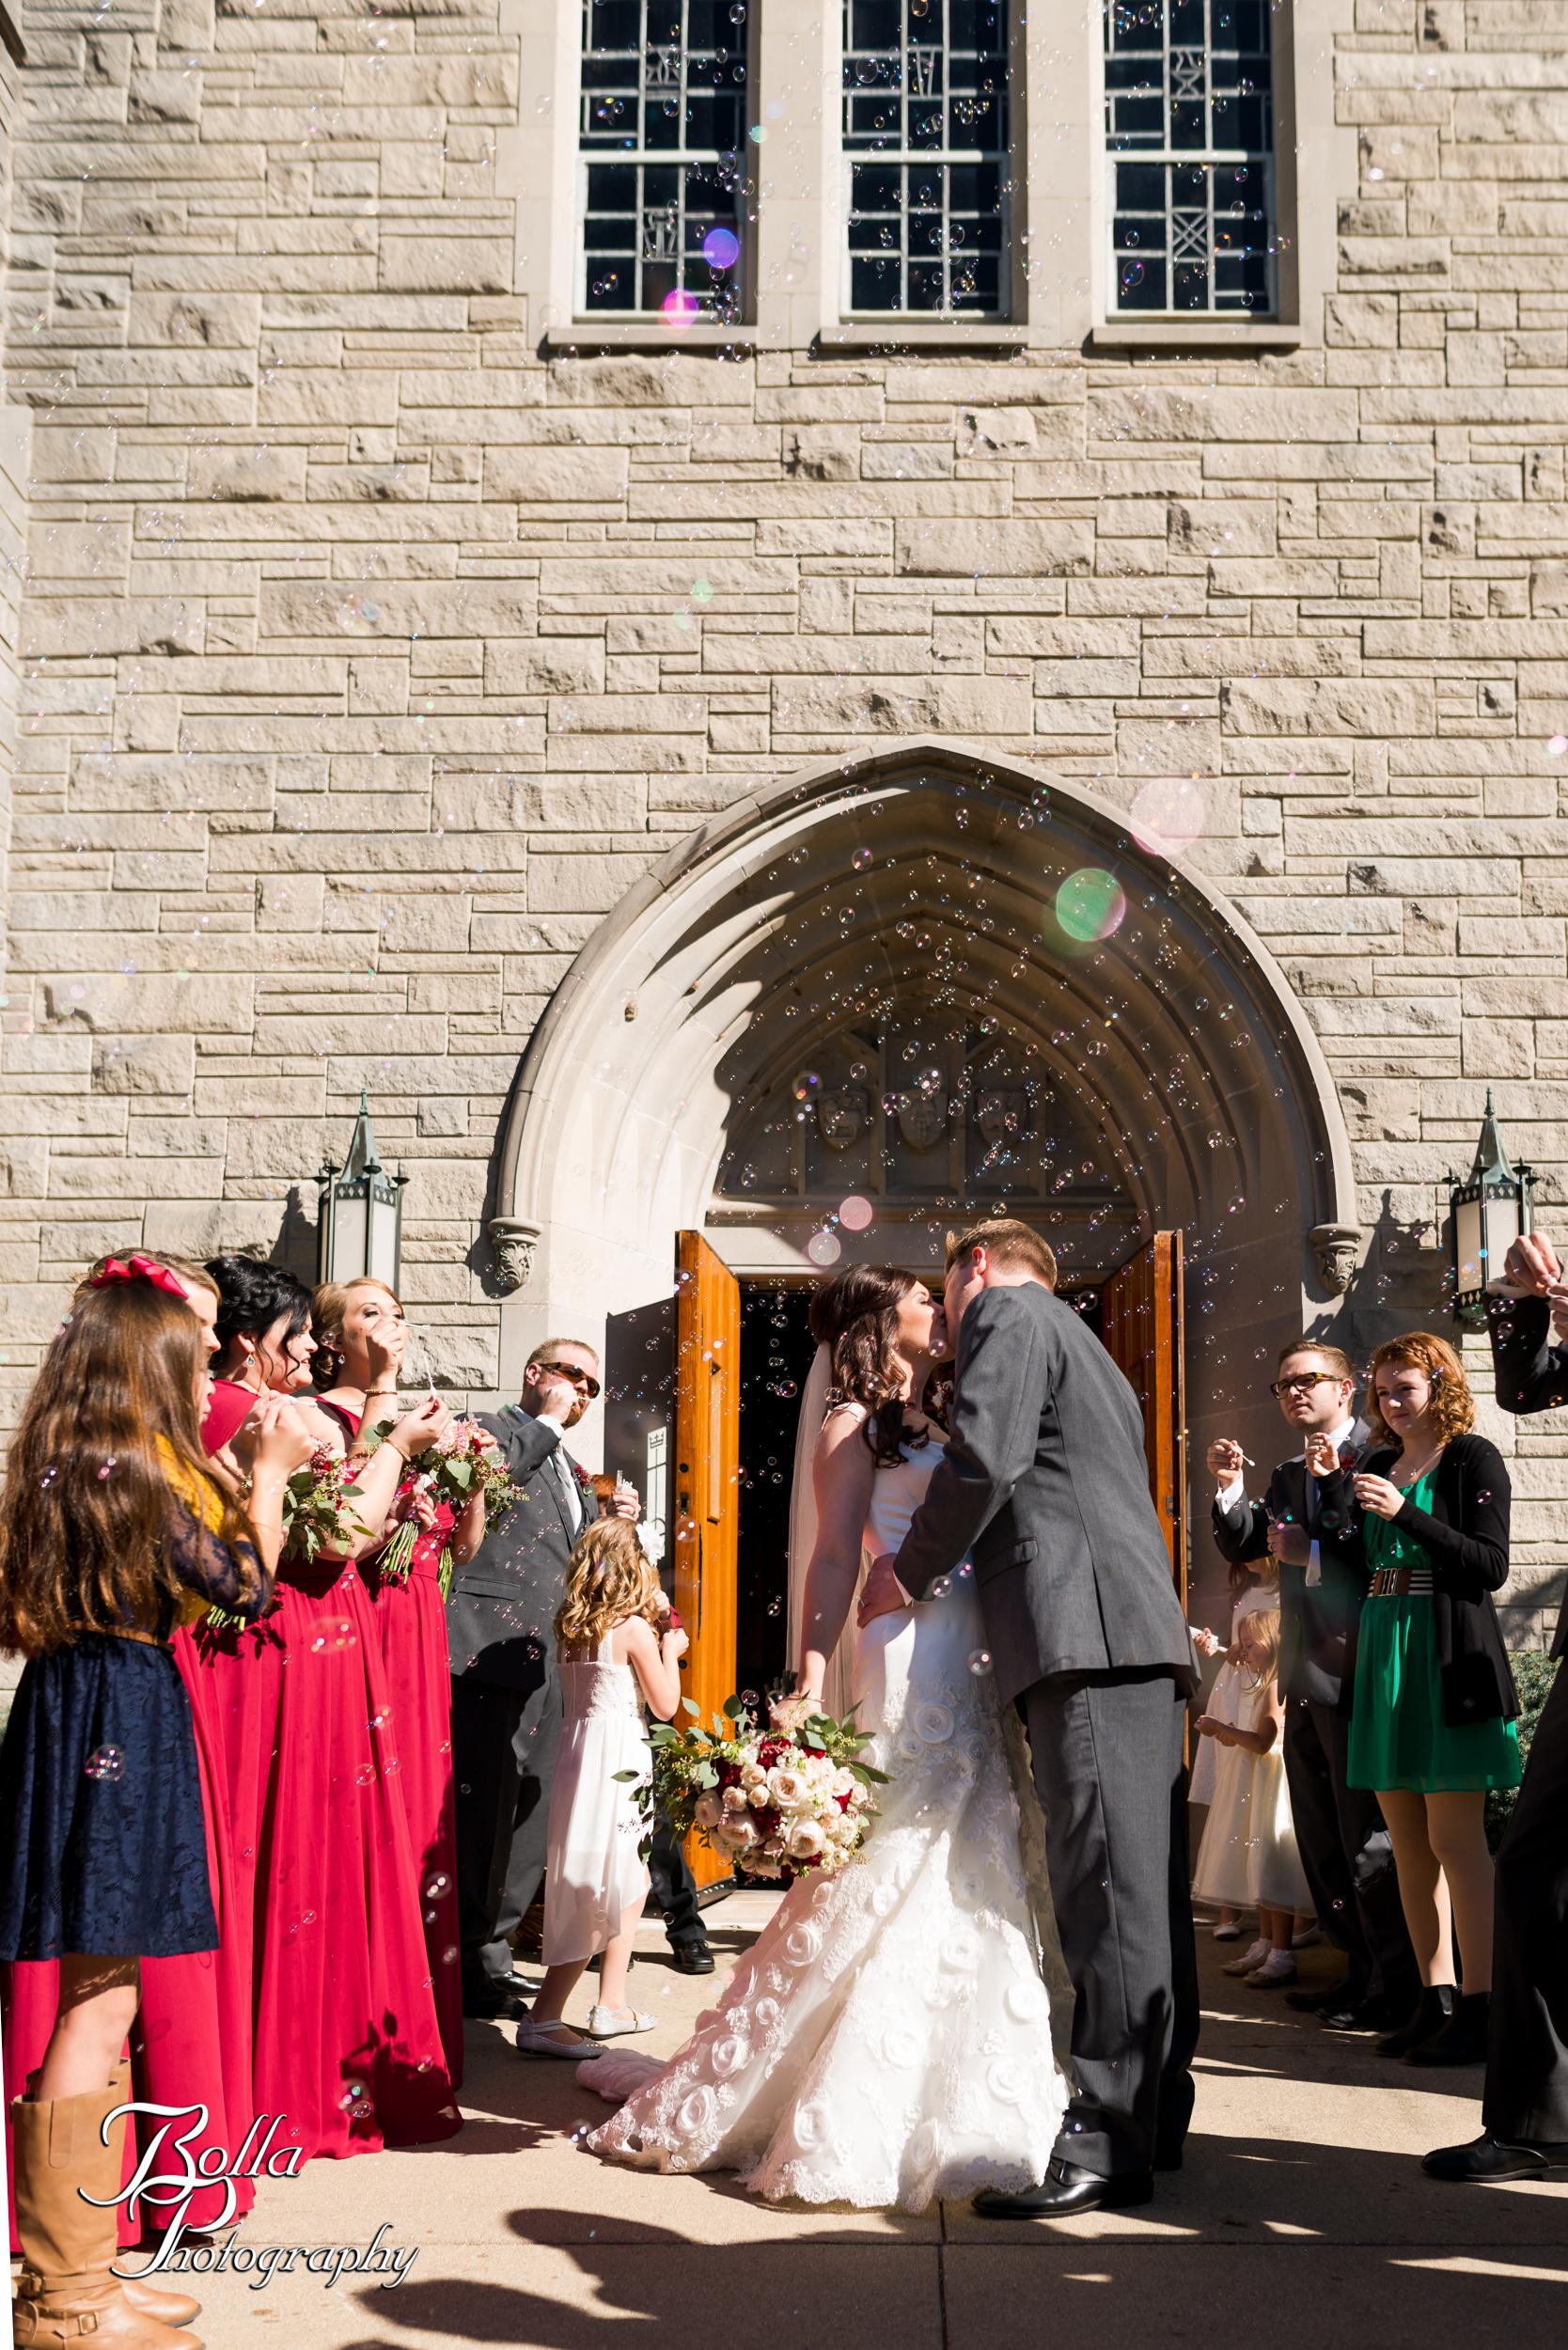 Bolla_photography_edwardsville_wedding_photographer_st_louis_weddings_Reilmann-0006.jpg